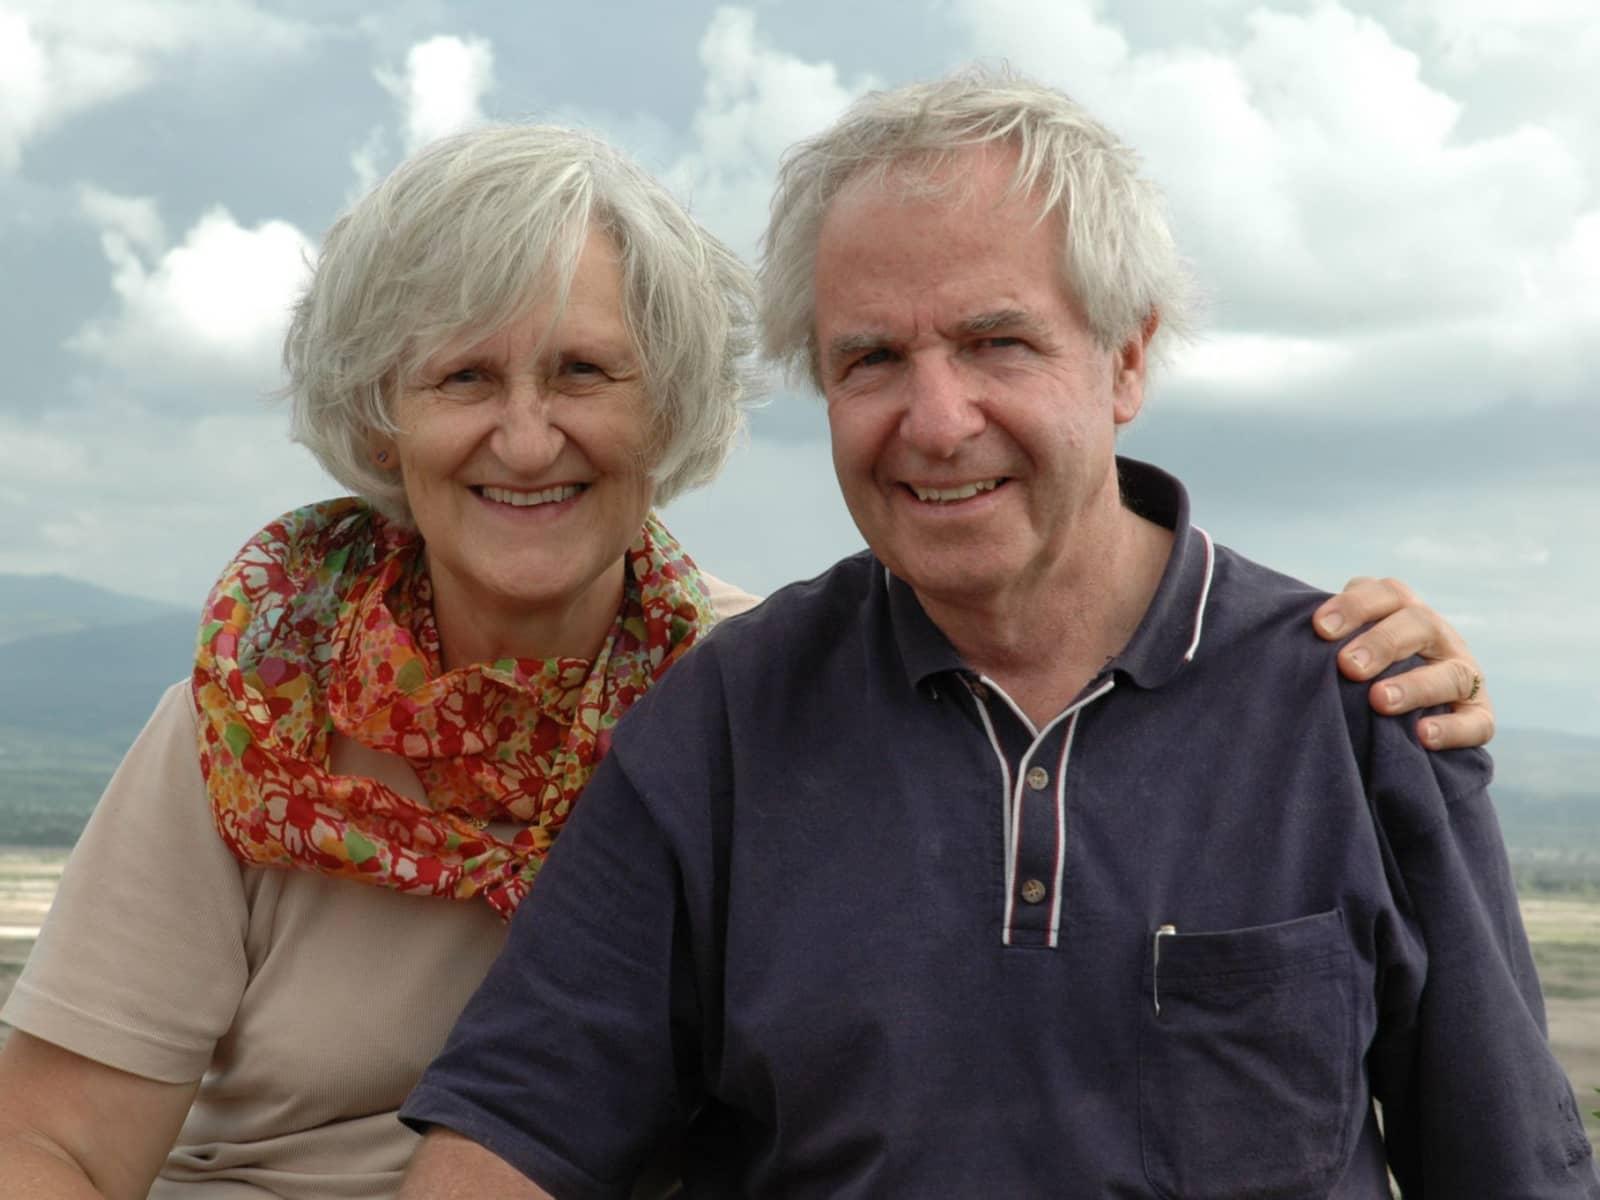 Edward & Rosemarie from Winnipeg, Manitoba, Canada